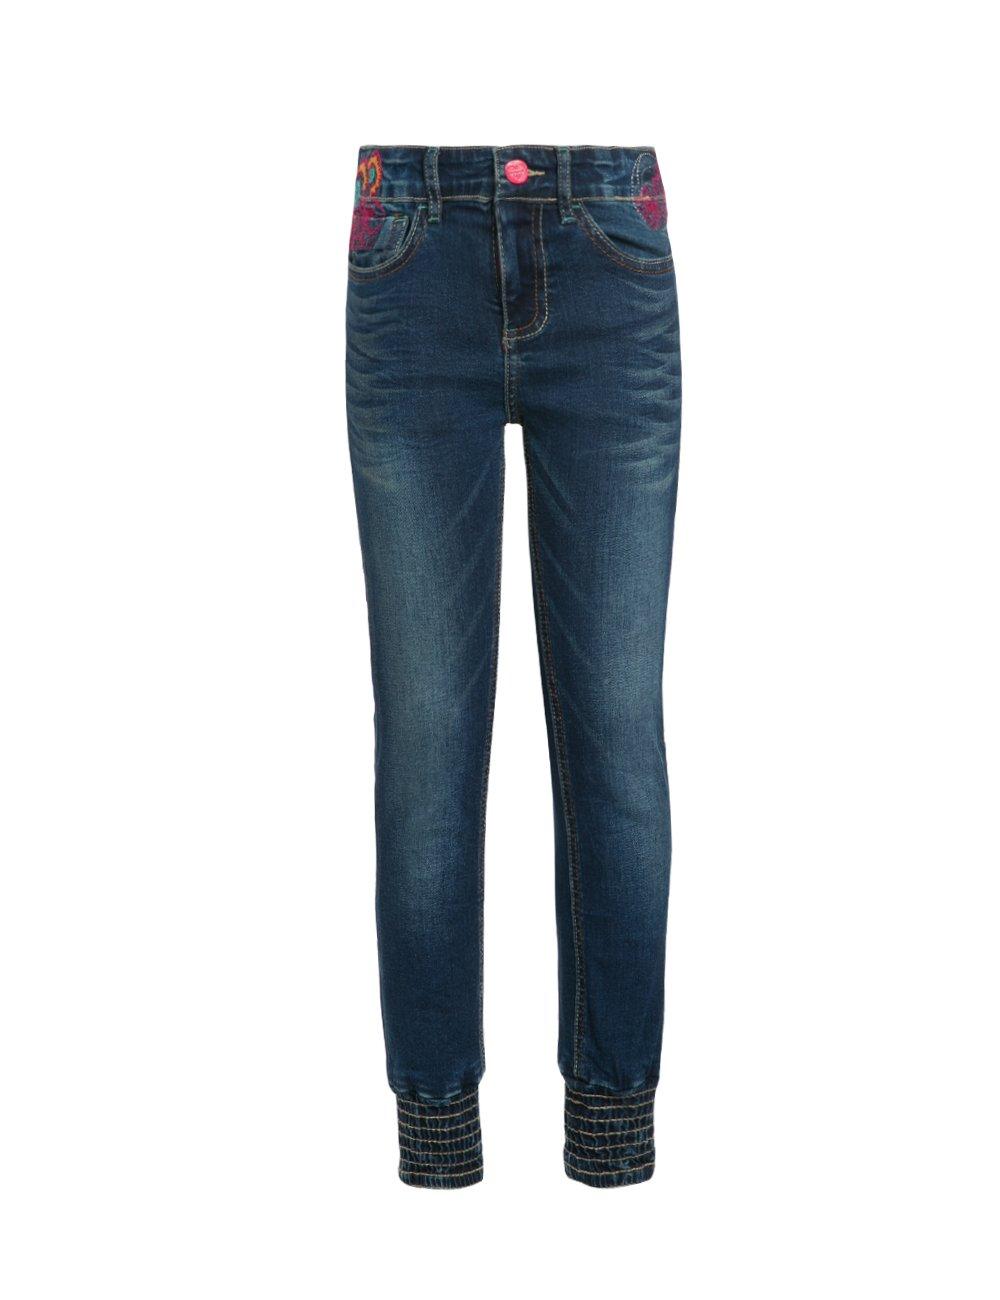 Desigual Denim_Ruiz Pantalones para Niñas